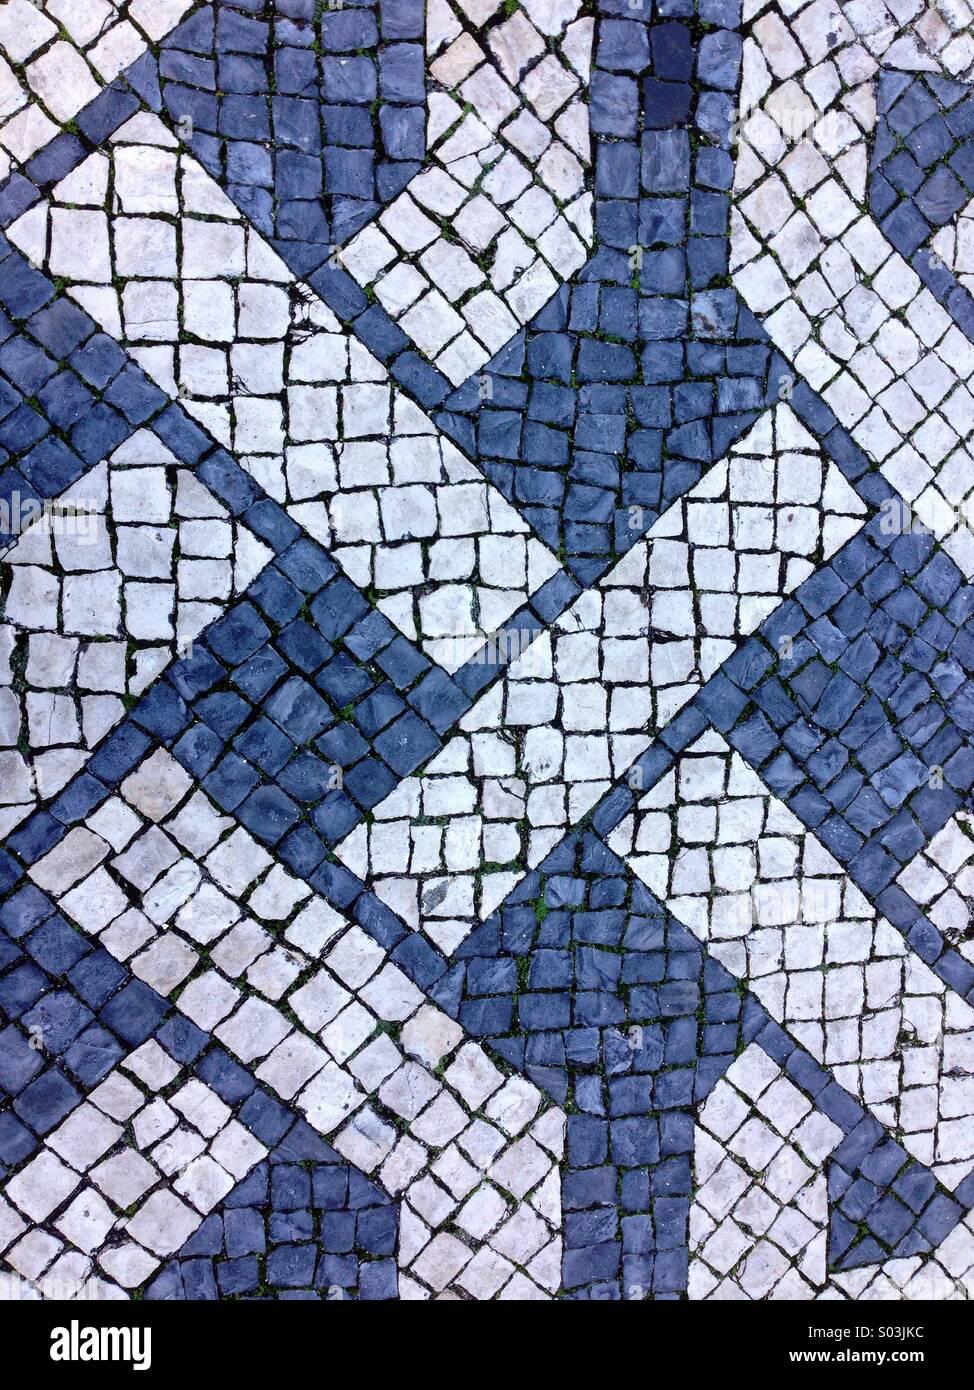 Sentieri artistici di Lisbona Foto Stock